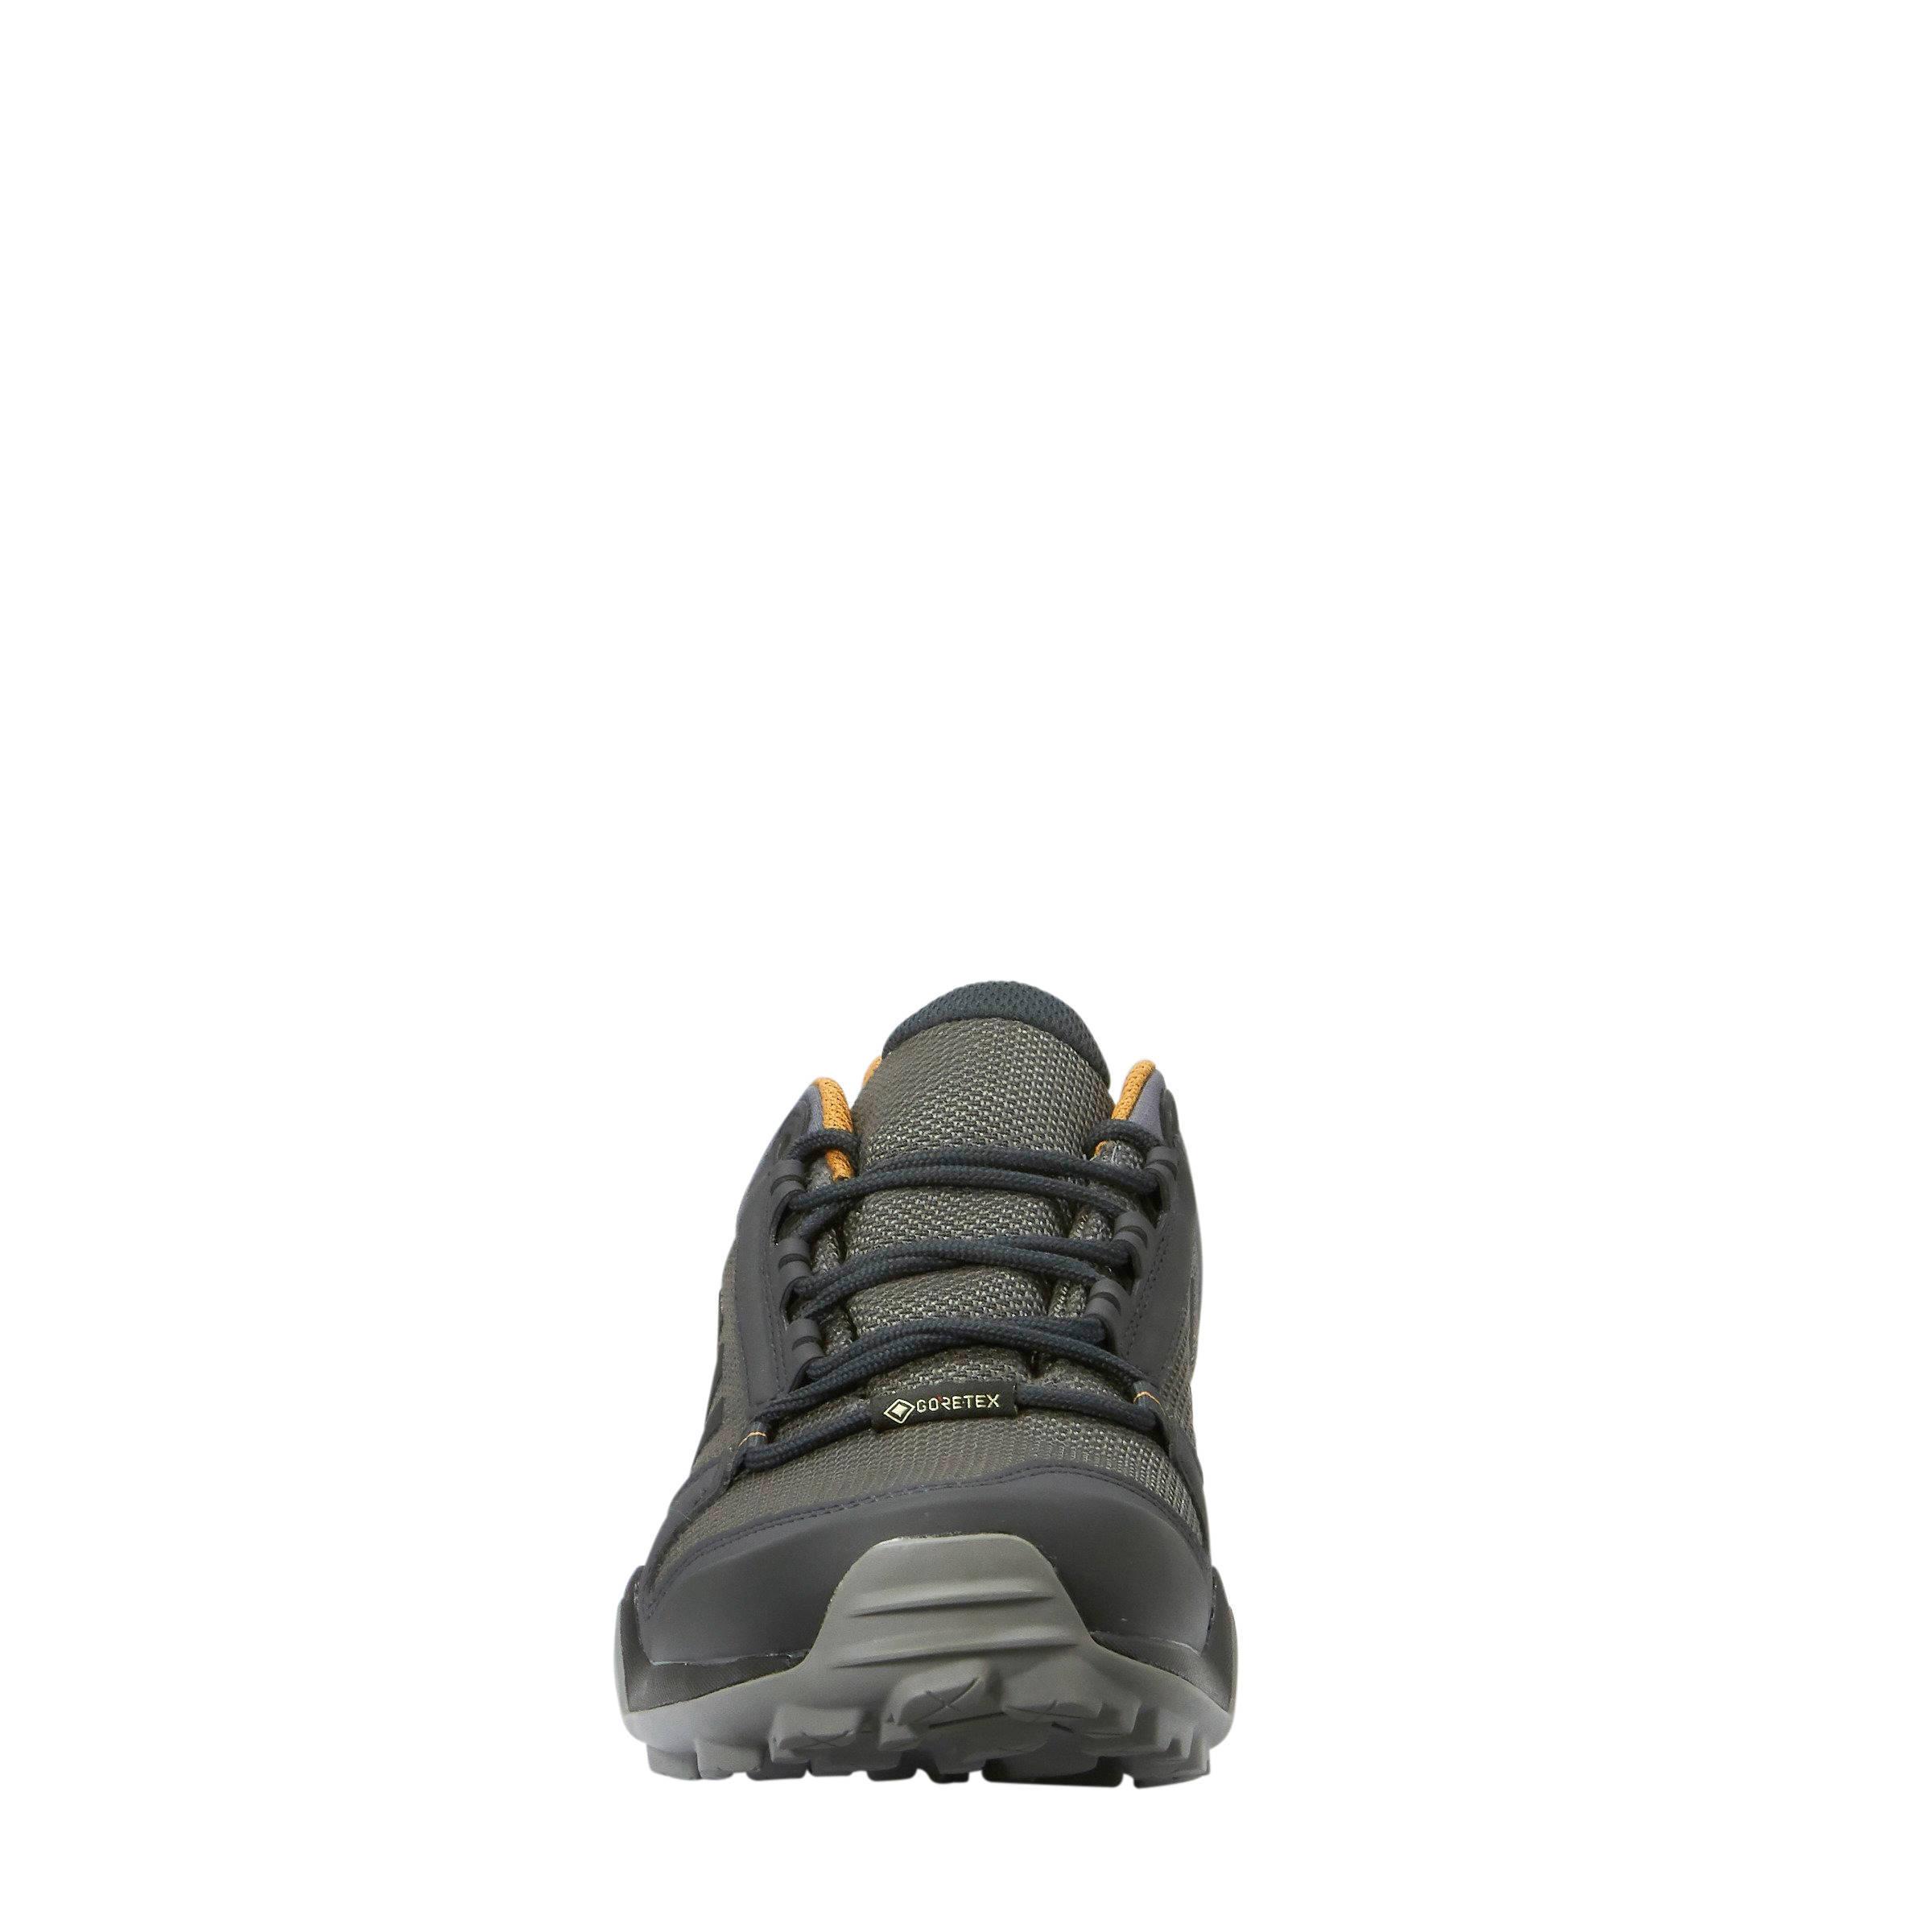 4bc3b9eb799 adidas performance Terrex AX3 GTX outdoor schoenen antraciet   wehkamp